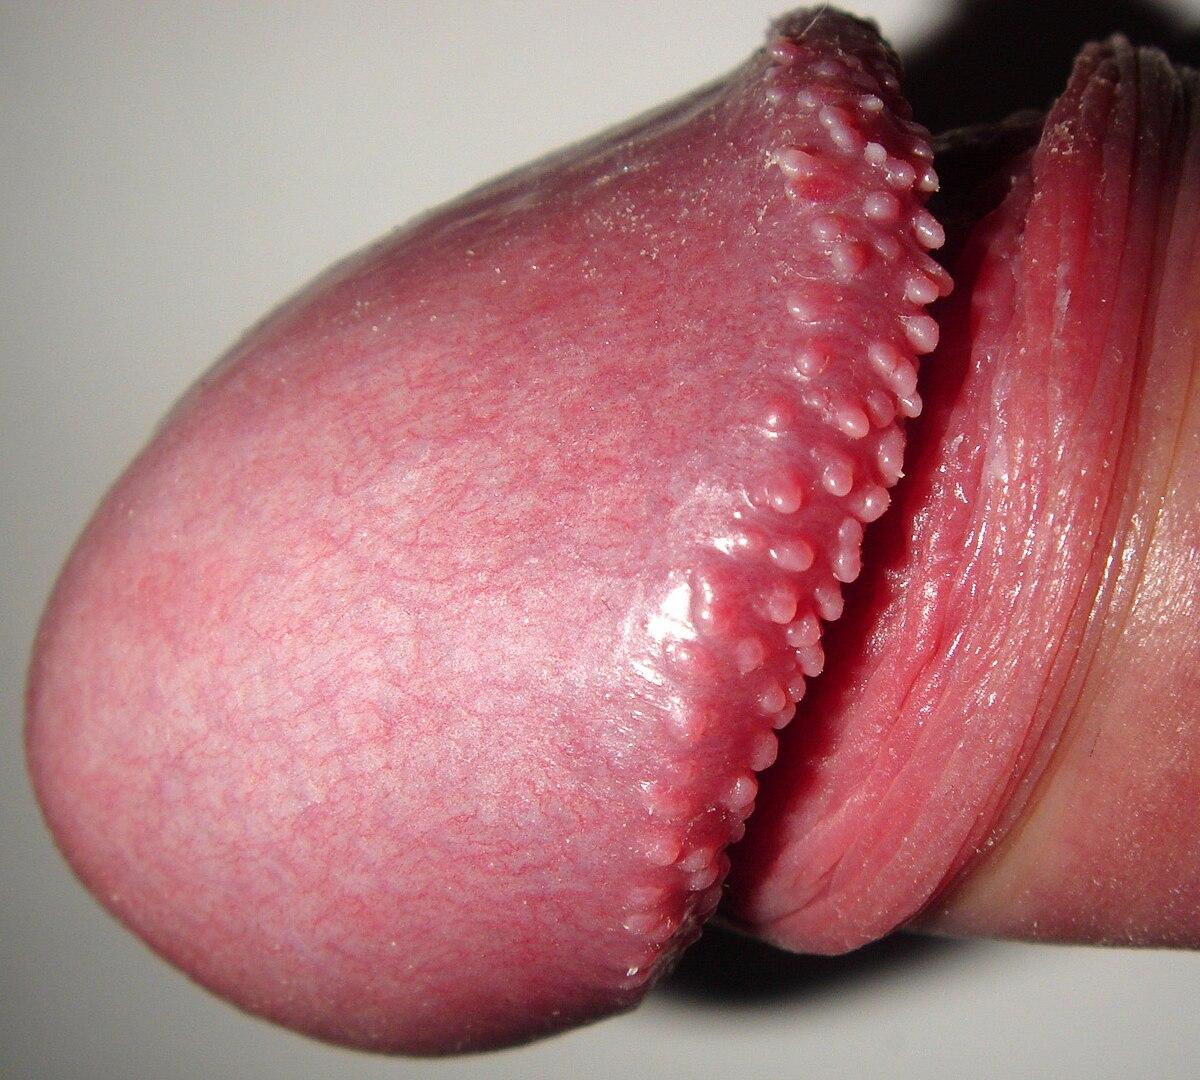 Human Papilloma Virus (HPV) - Invitro Diagnostics